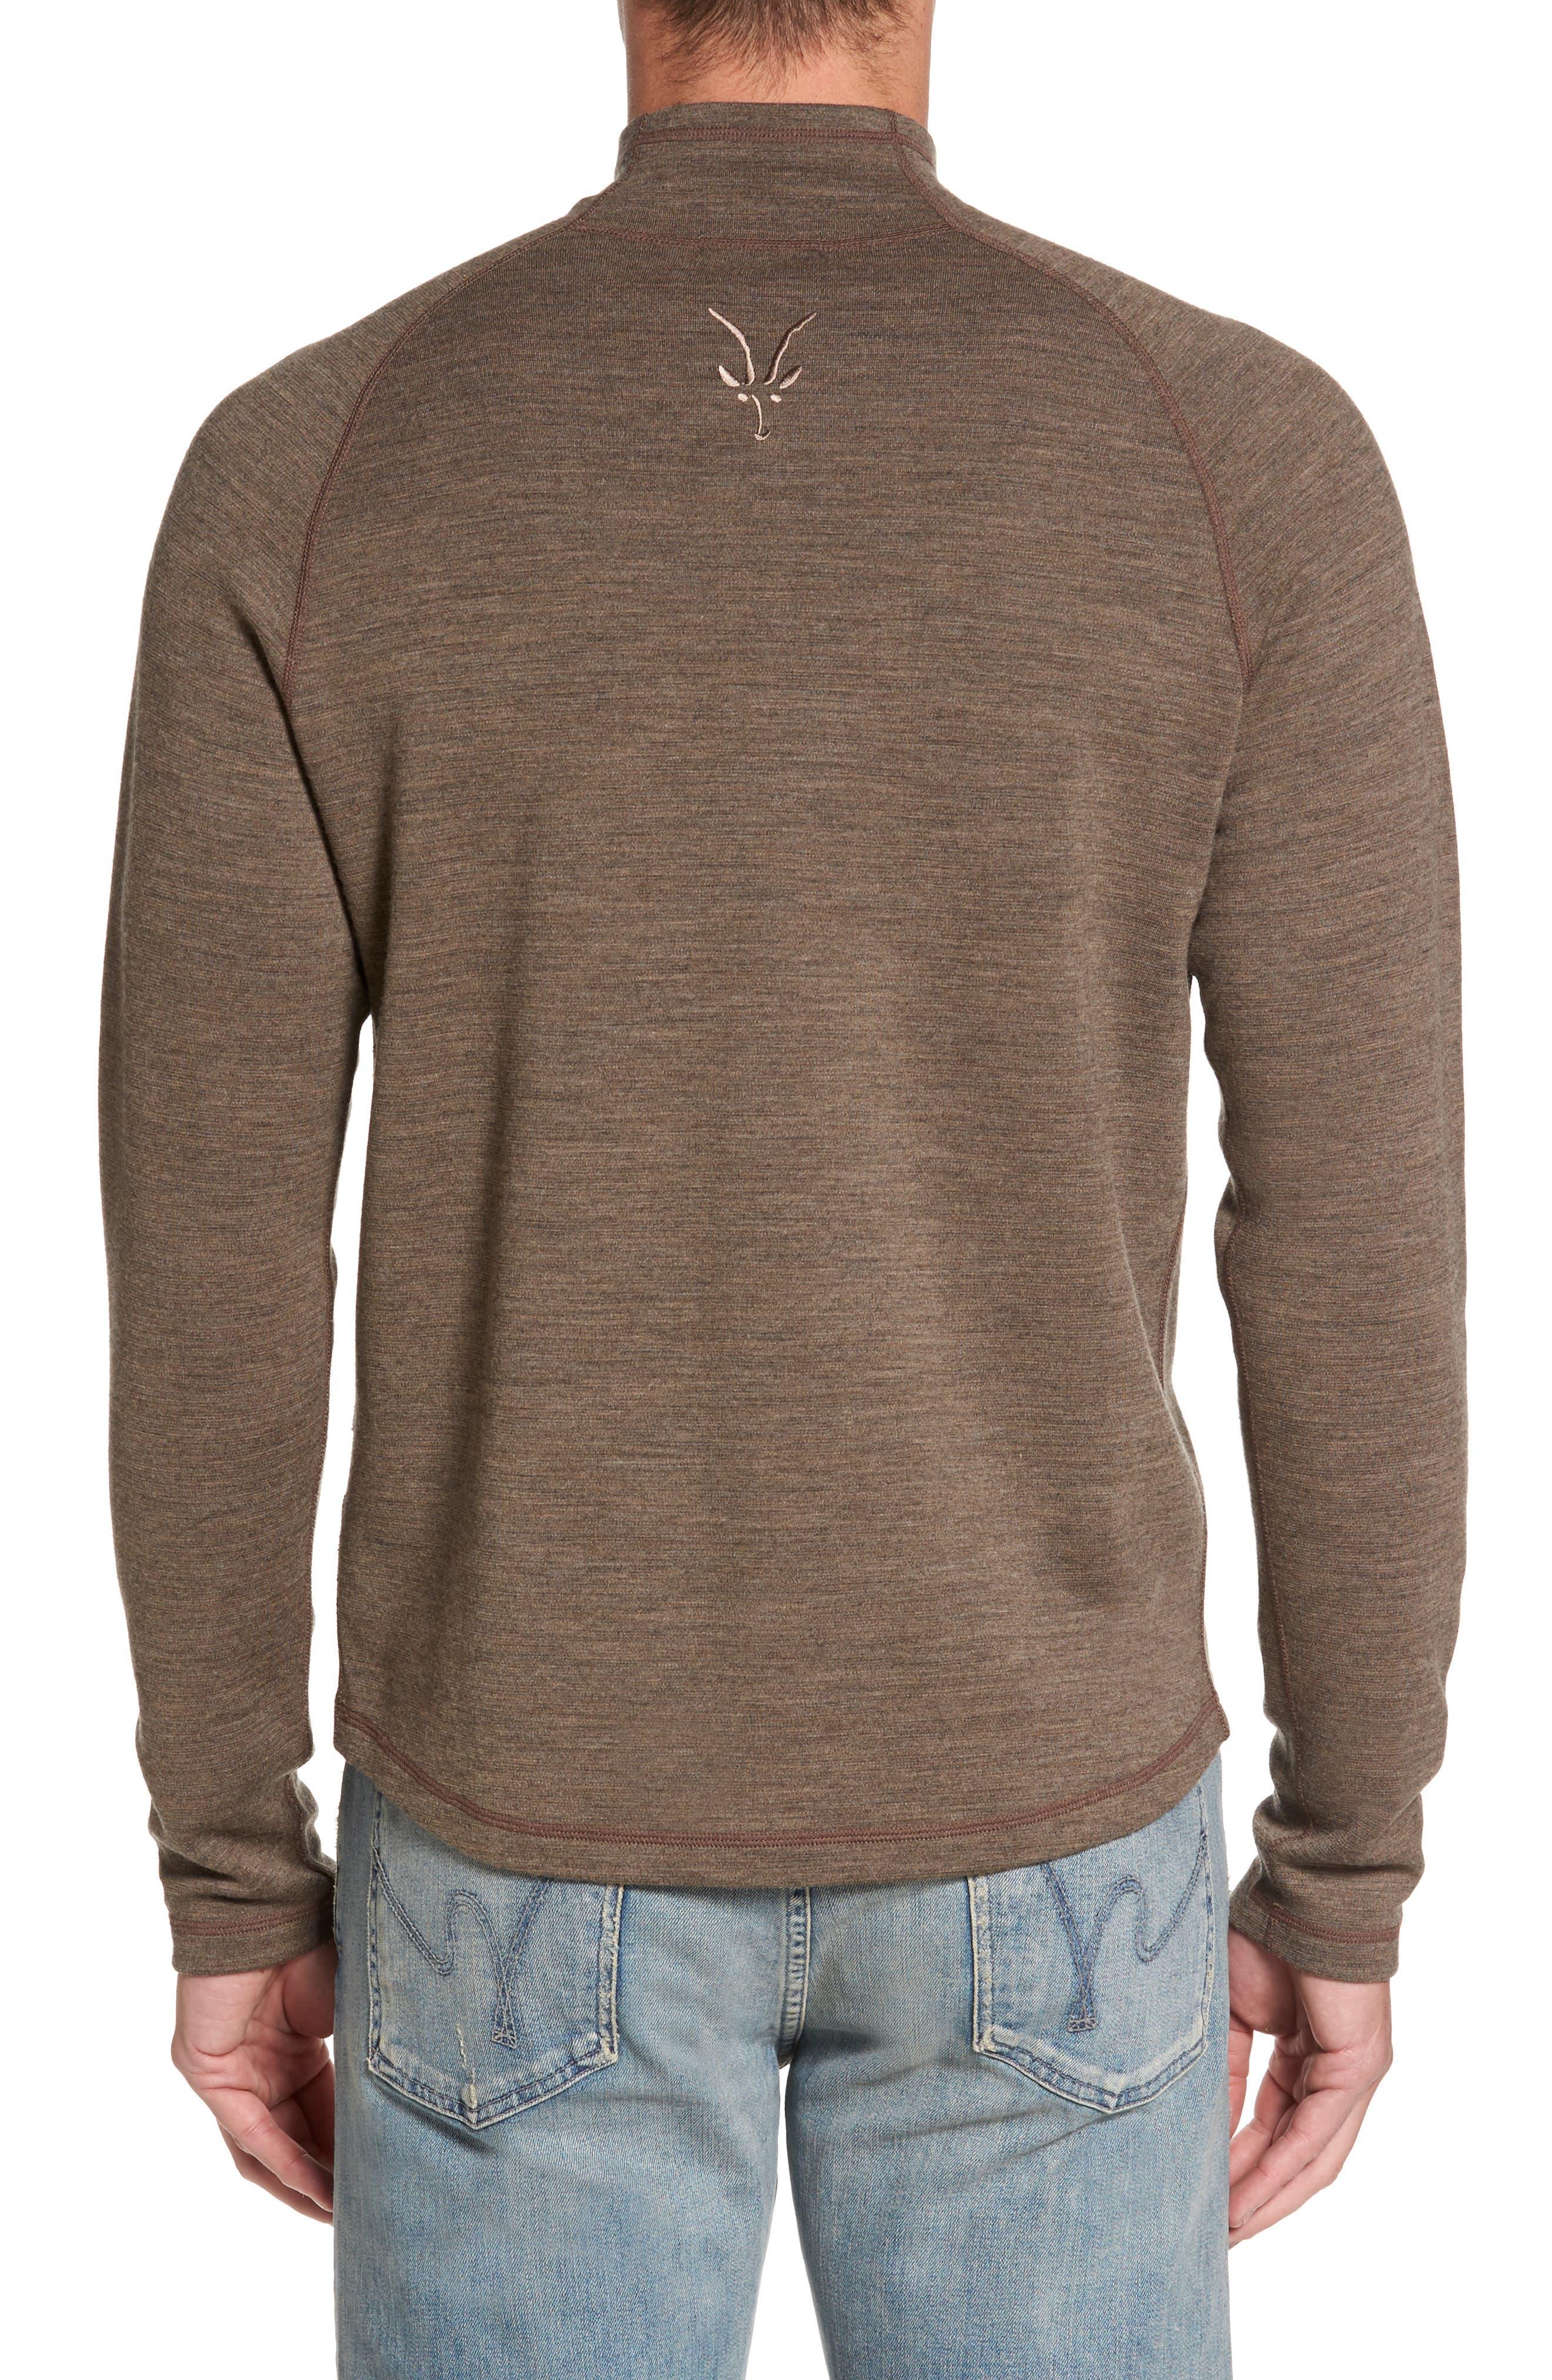 'Shak' Merino Wool Quarter Zip Top,                             Alternate thumbnail 2, color,                             Dark Rye Heather